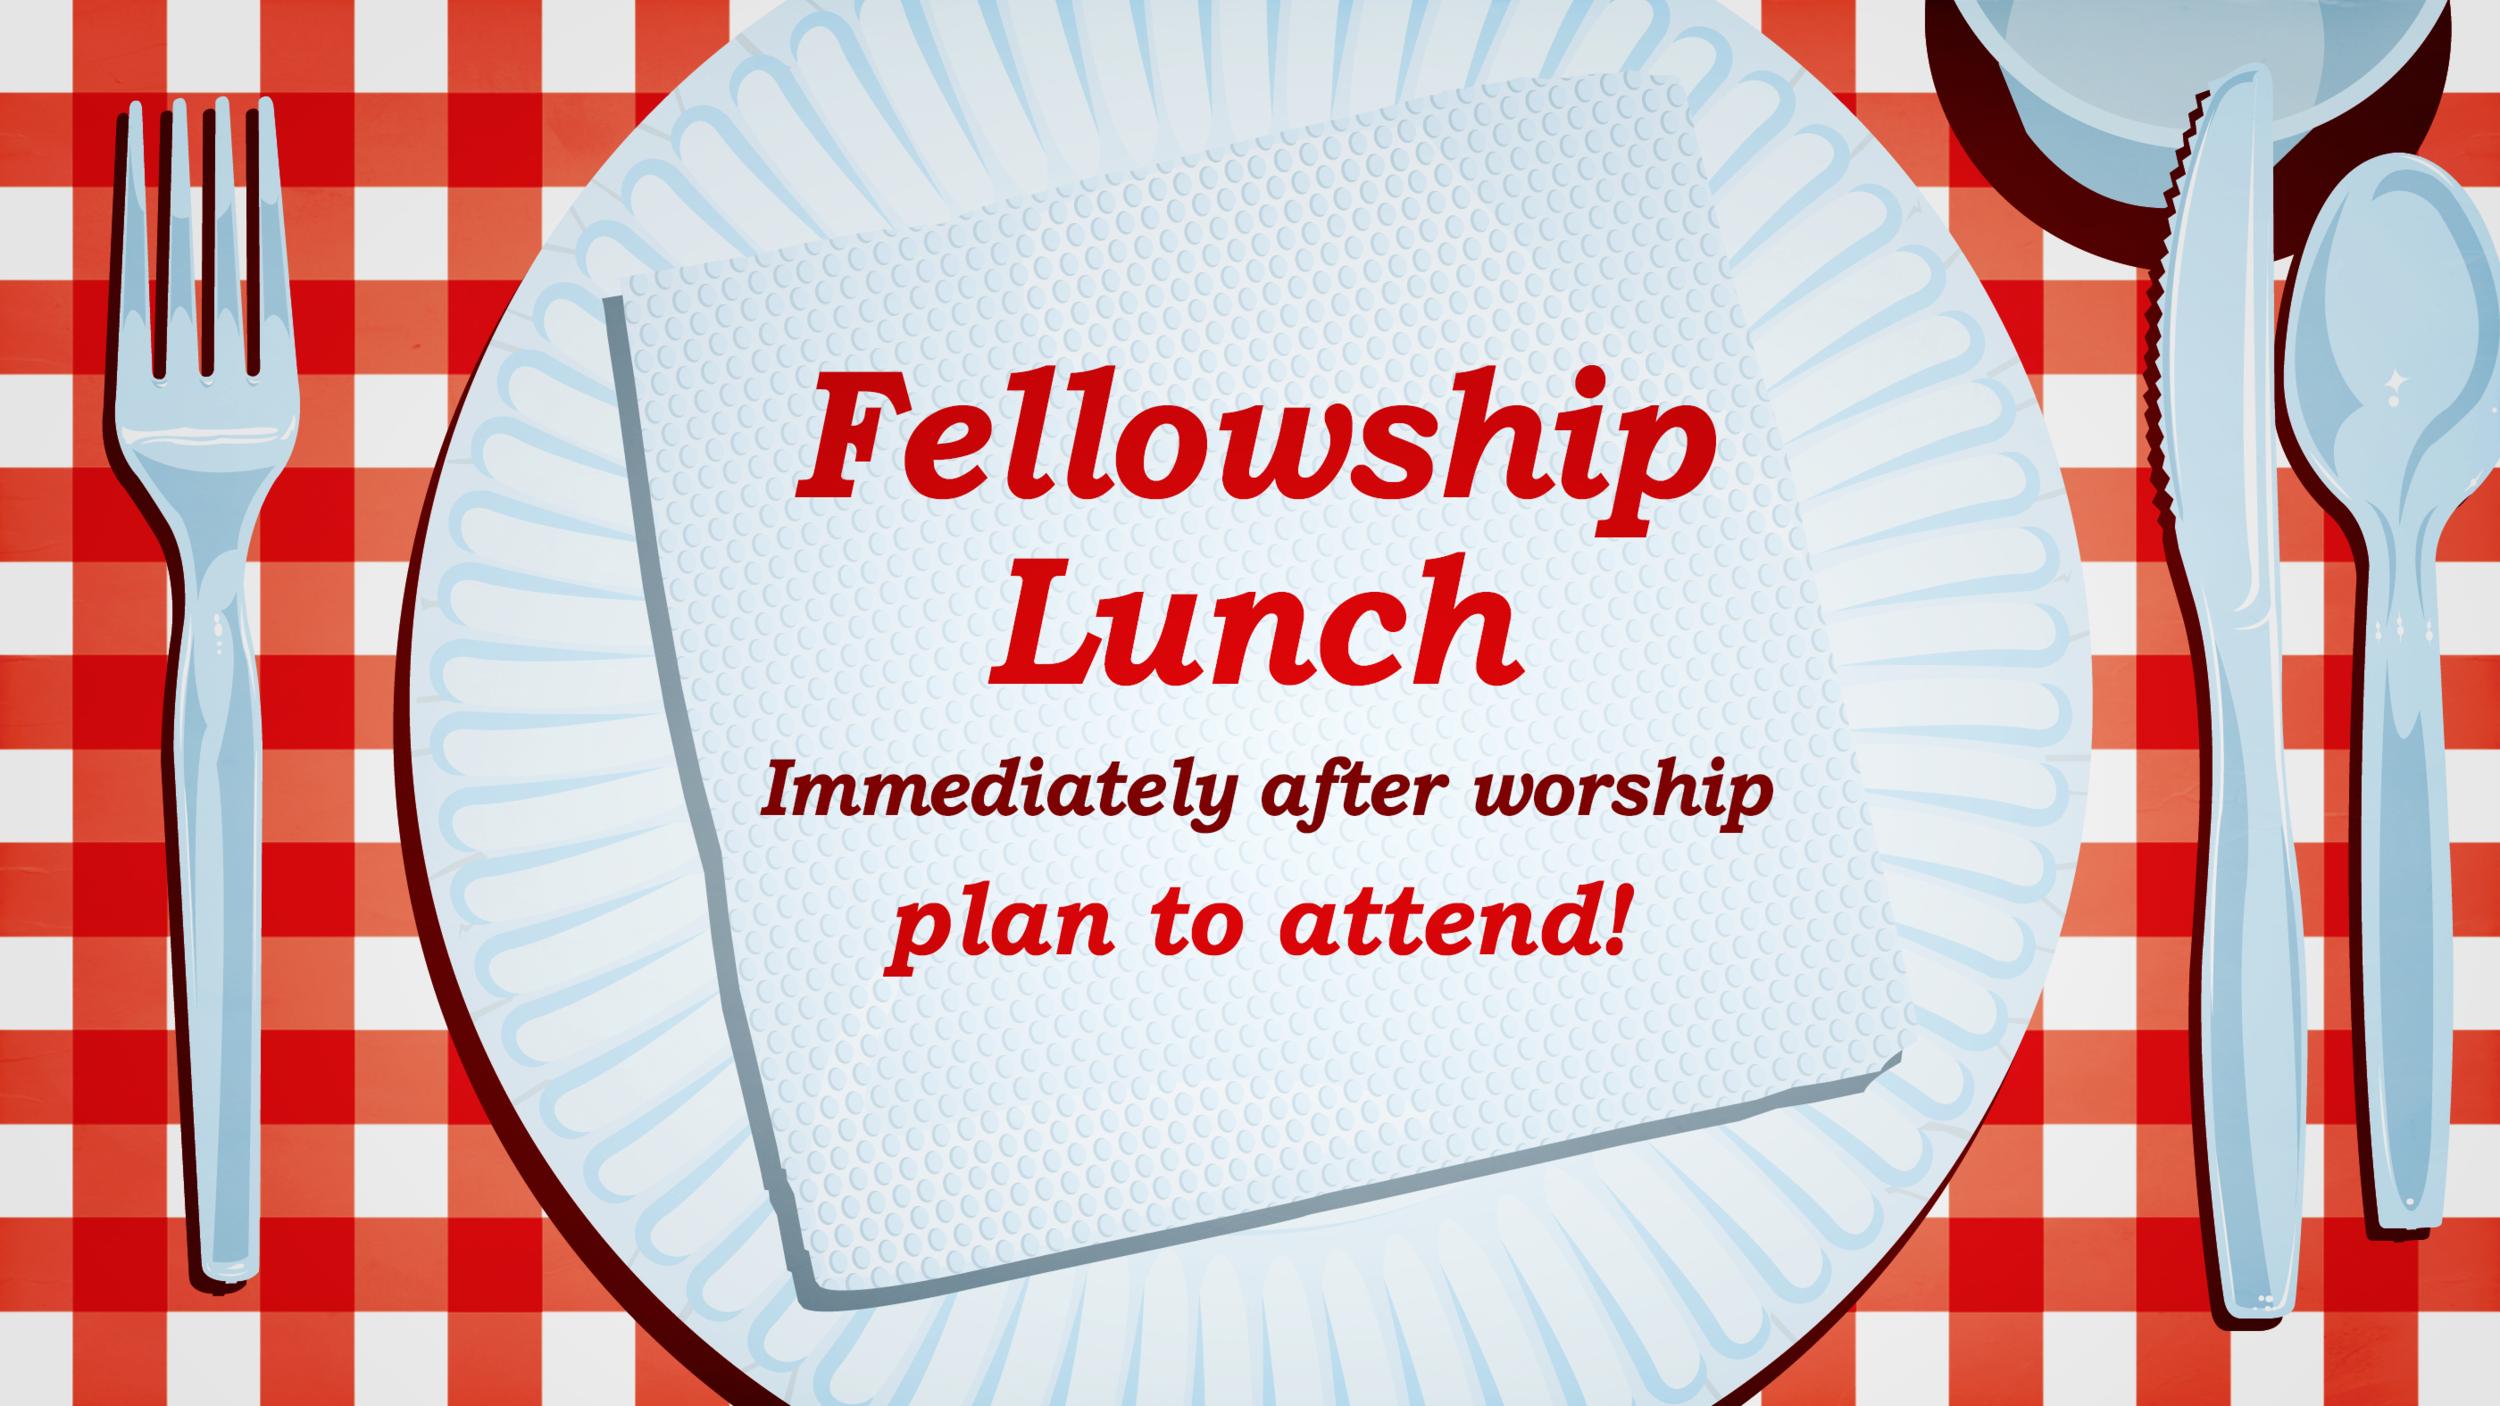 Fellowship Luncheon — First Christian Church, Keswick